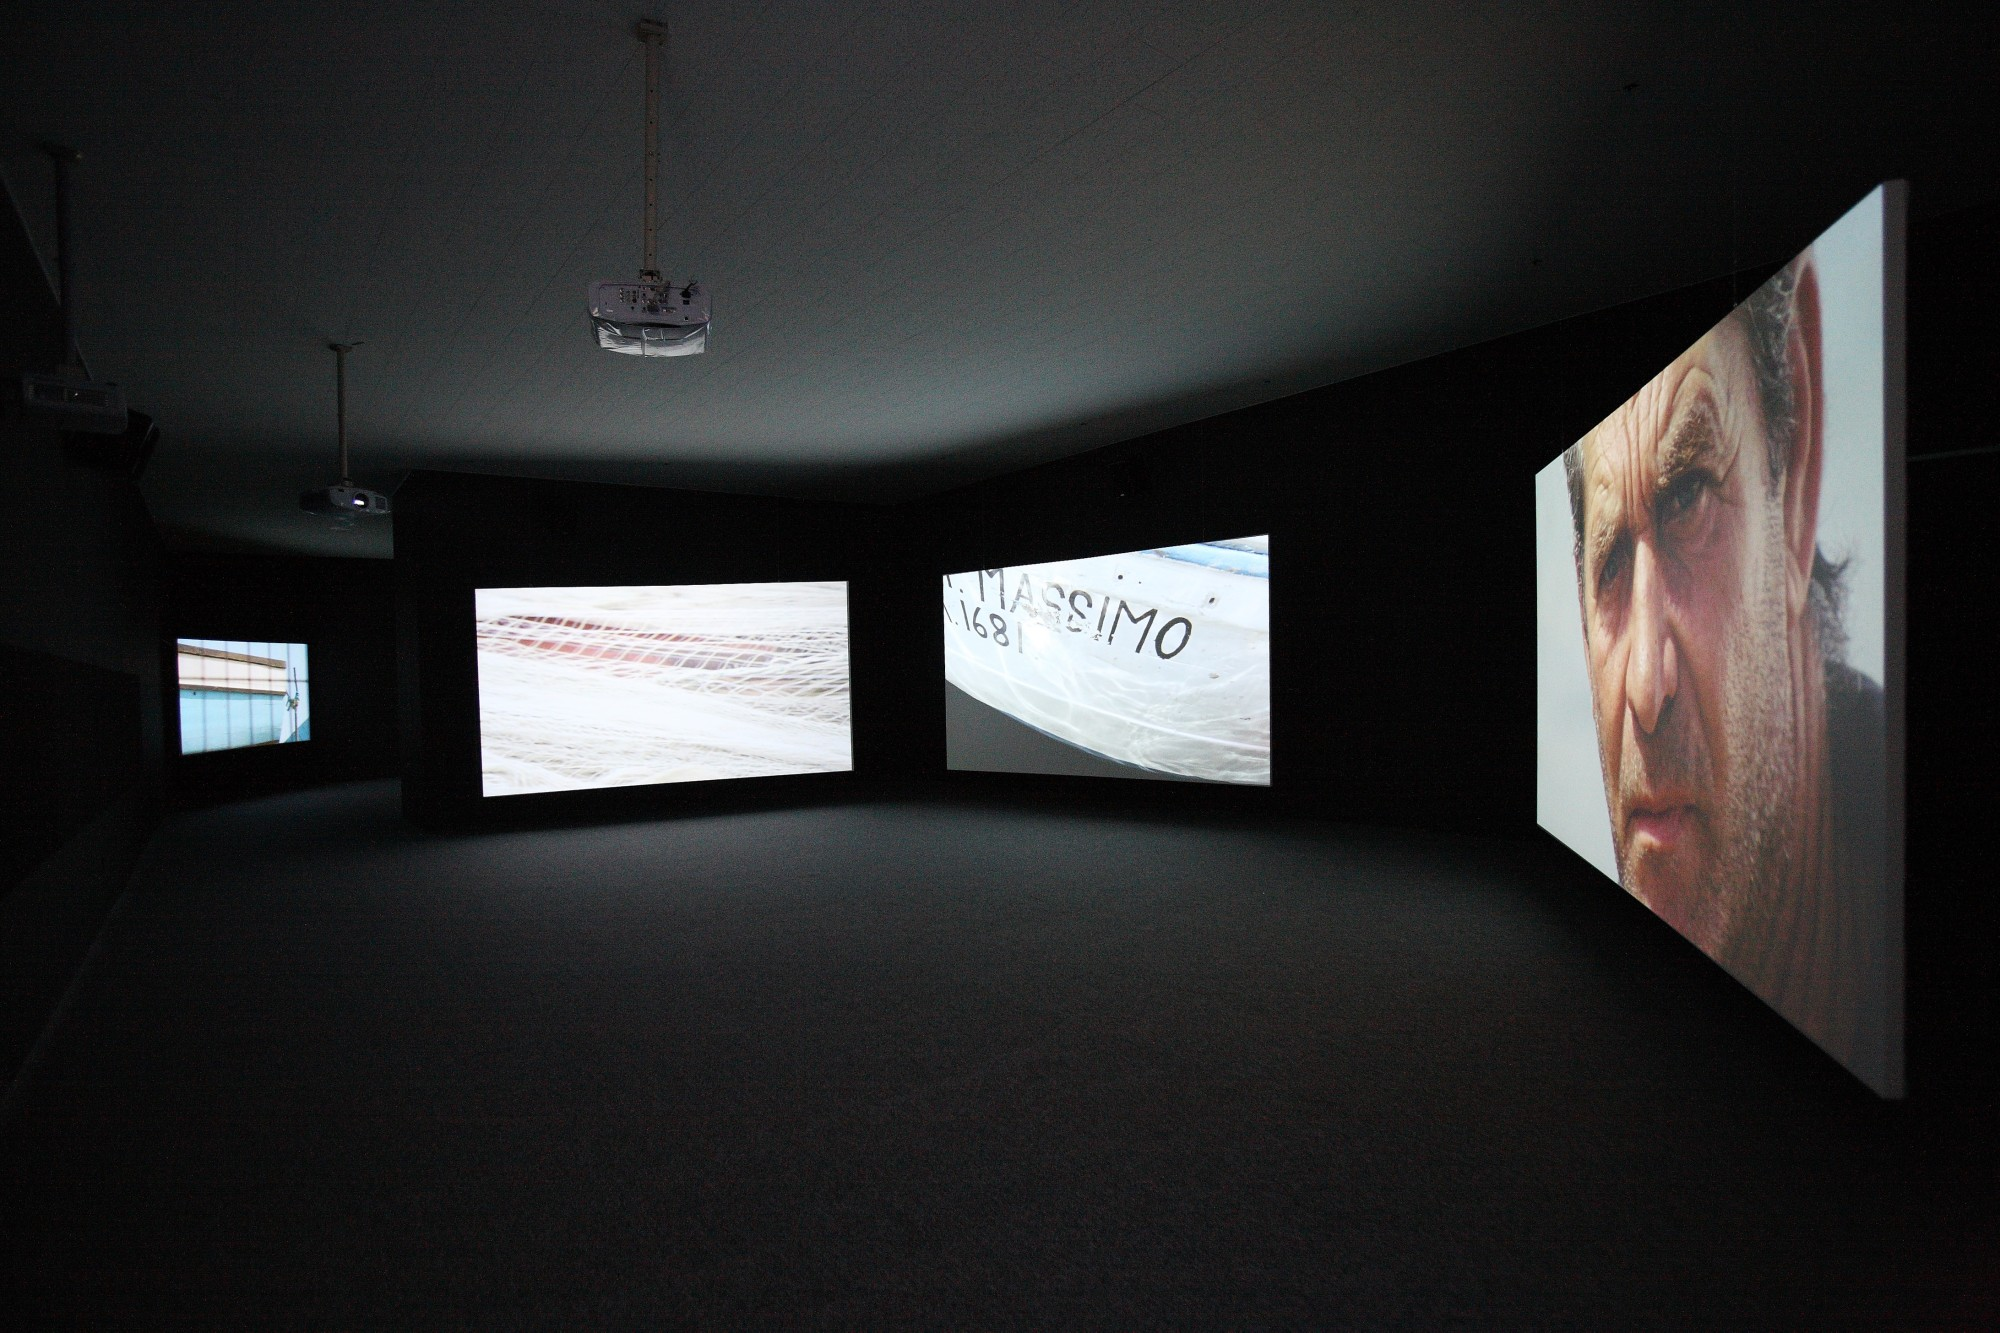 Annual Report. Gwangju Biennale, 2009  18'22', five-screen film installation, 16mm film transferred to digital, colour, 5.1 sound